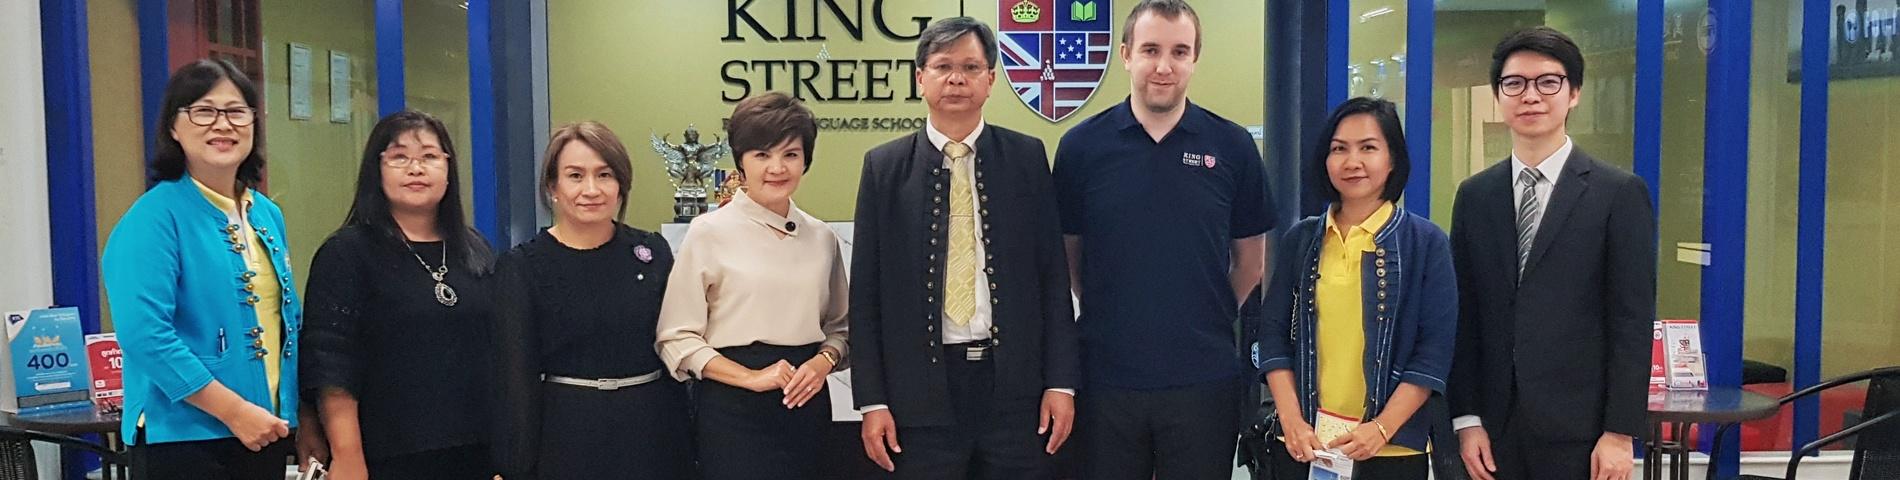 King Street English Language School Bild 1